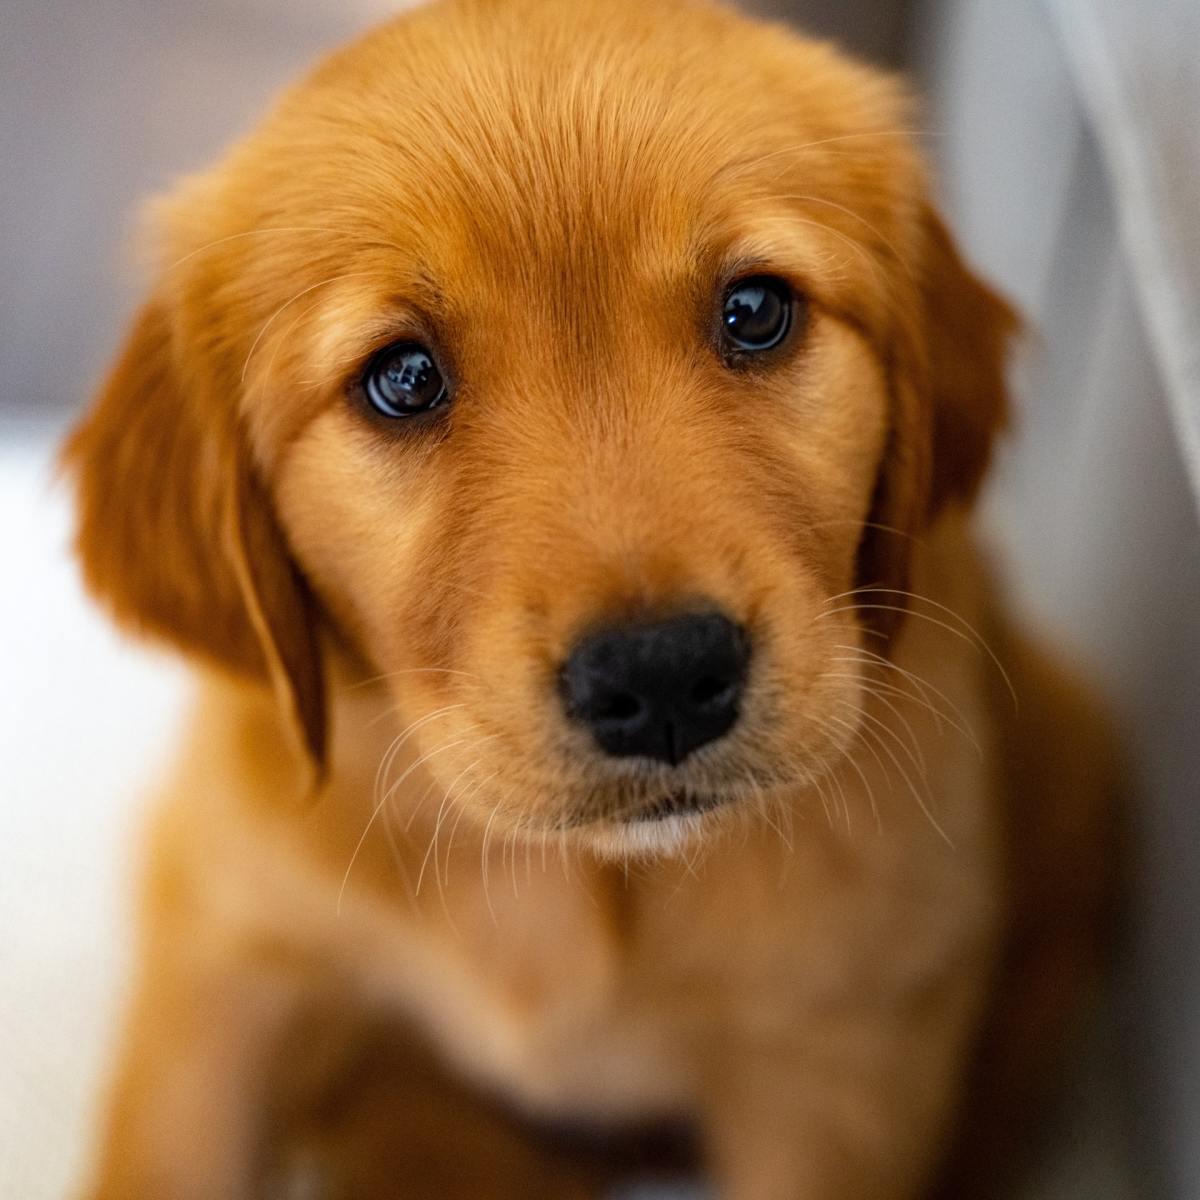 when-do-puppies-open-their-eyes